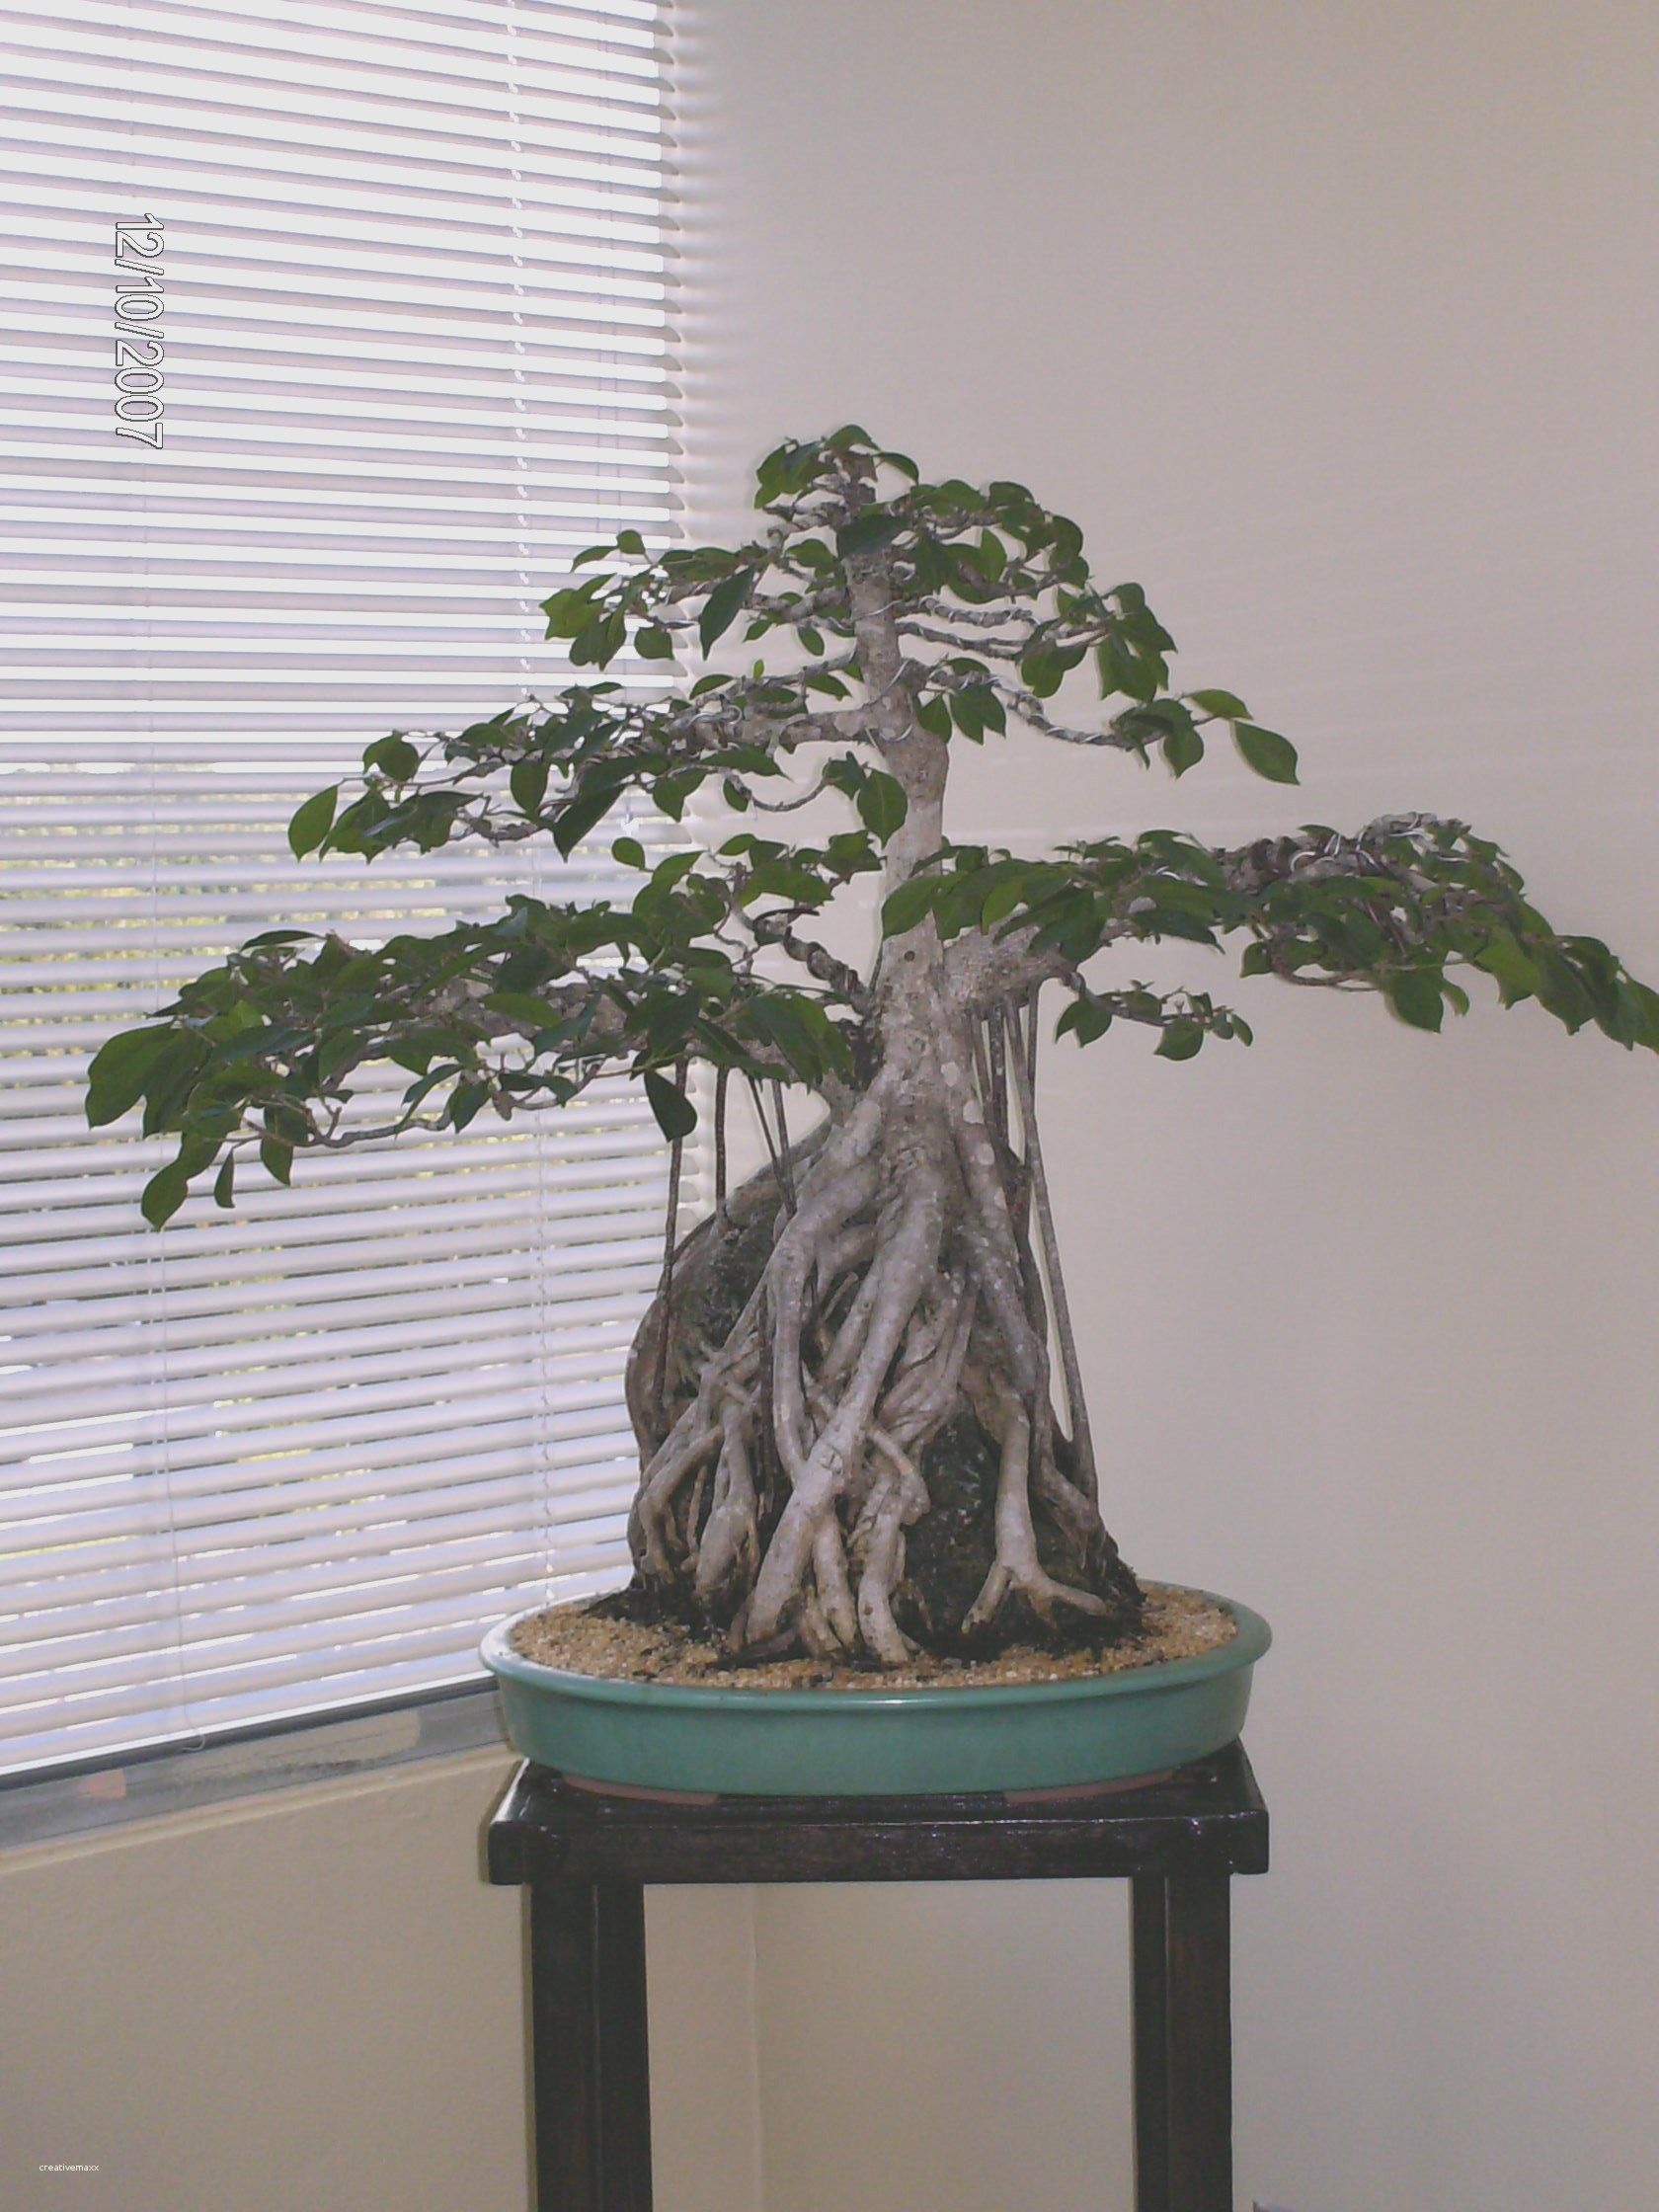 Elegant Bonsai Tree Indoor House Plants | Bonsai, Indoor house ...